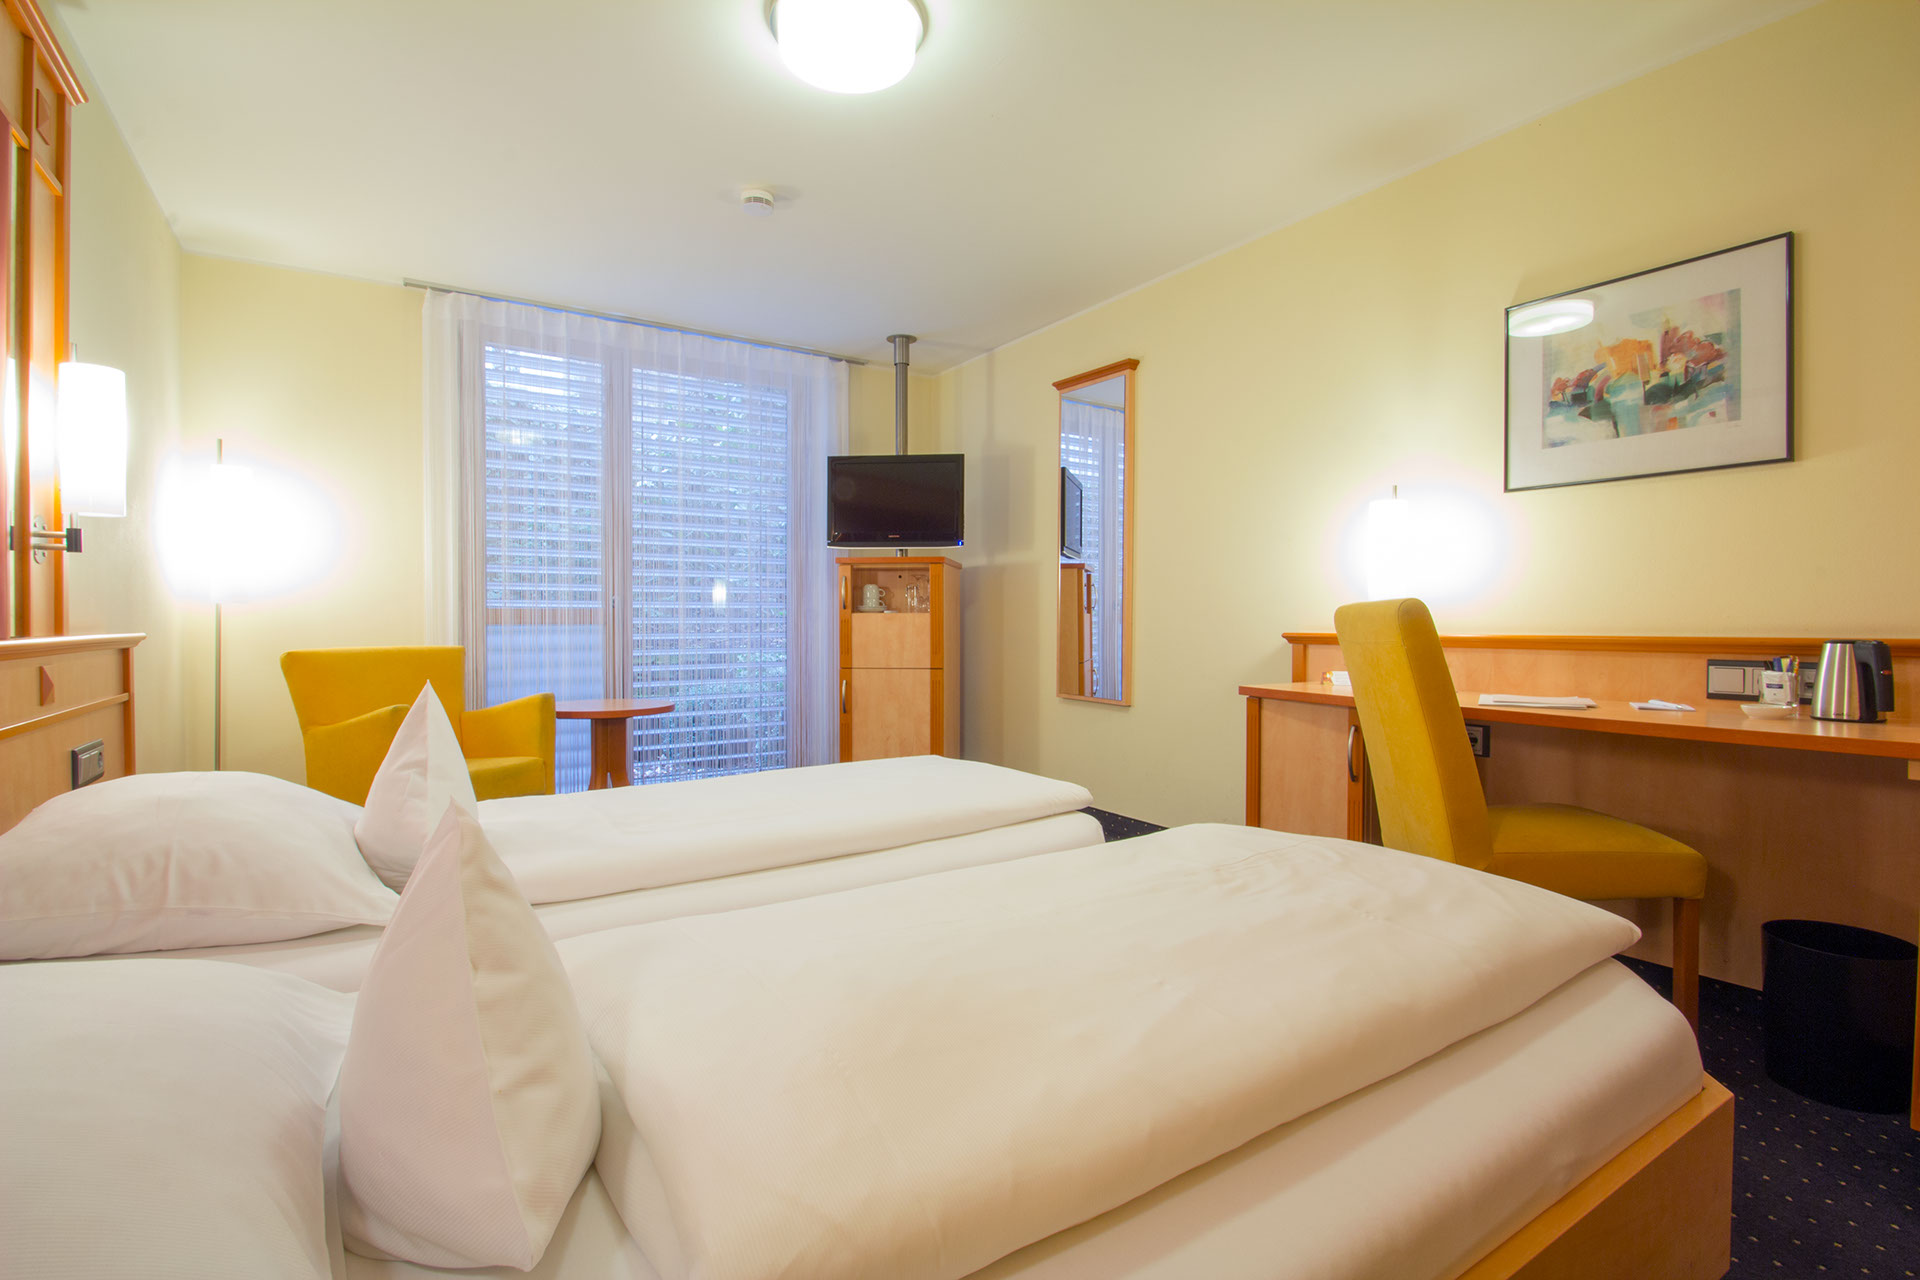 Hotel RIO Karlsruhe 4Sterne Resort